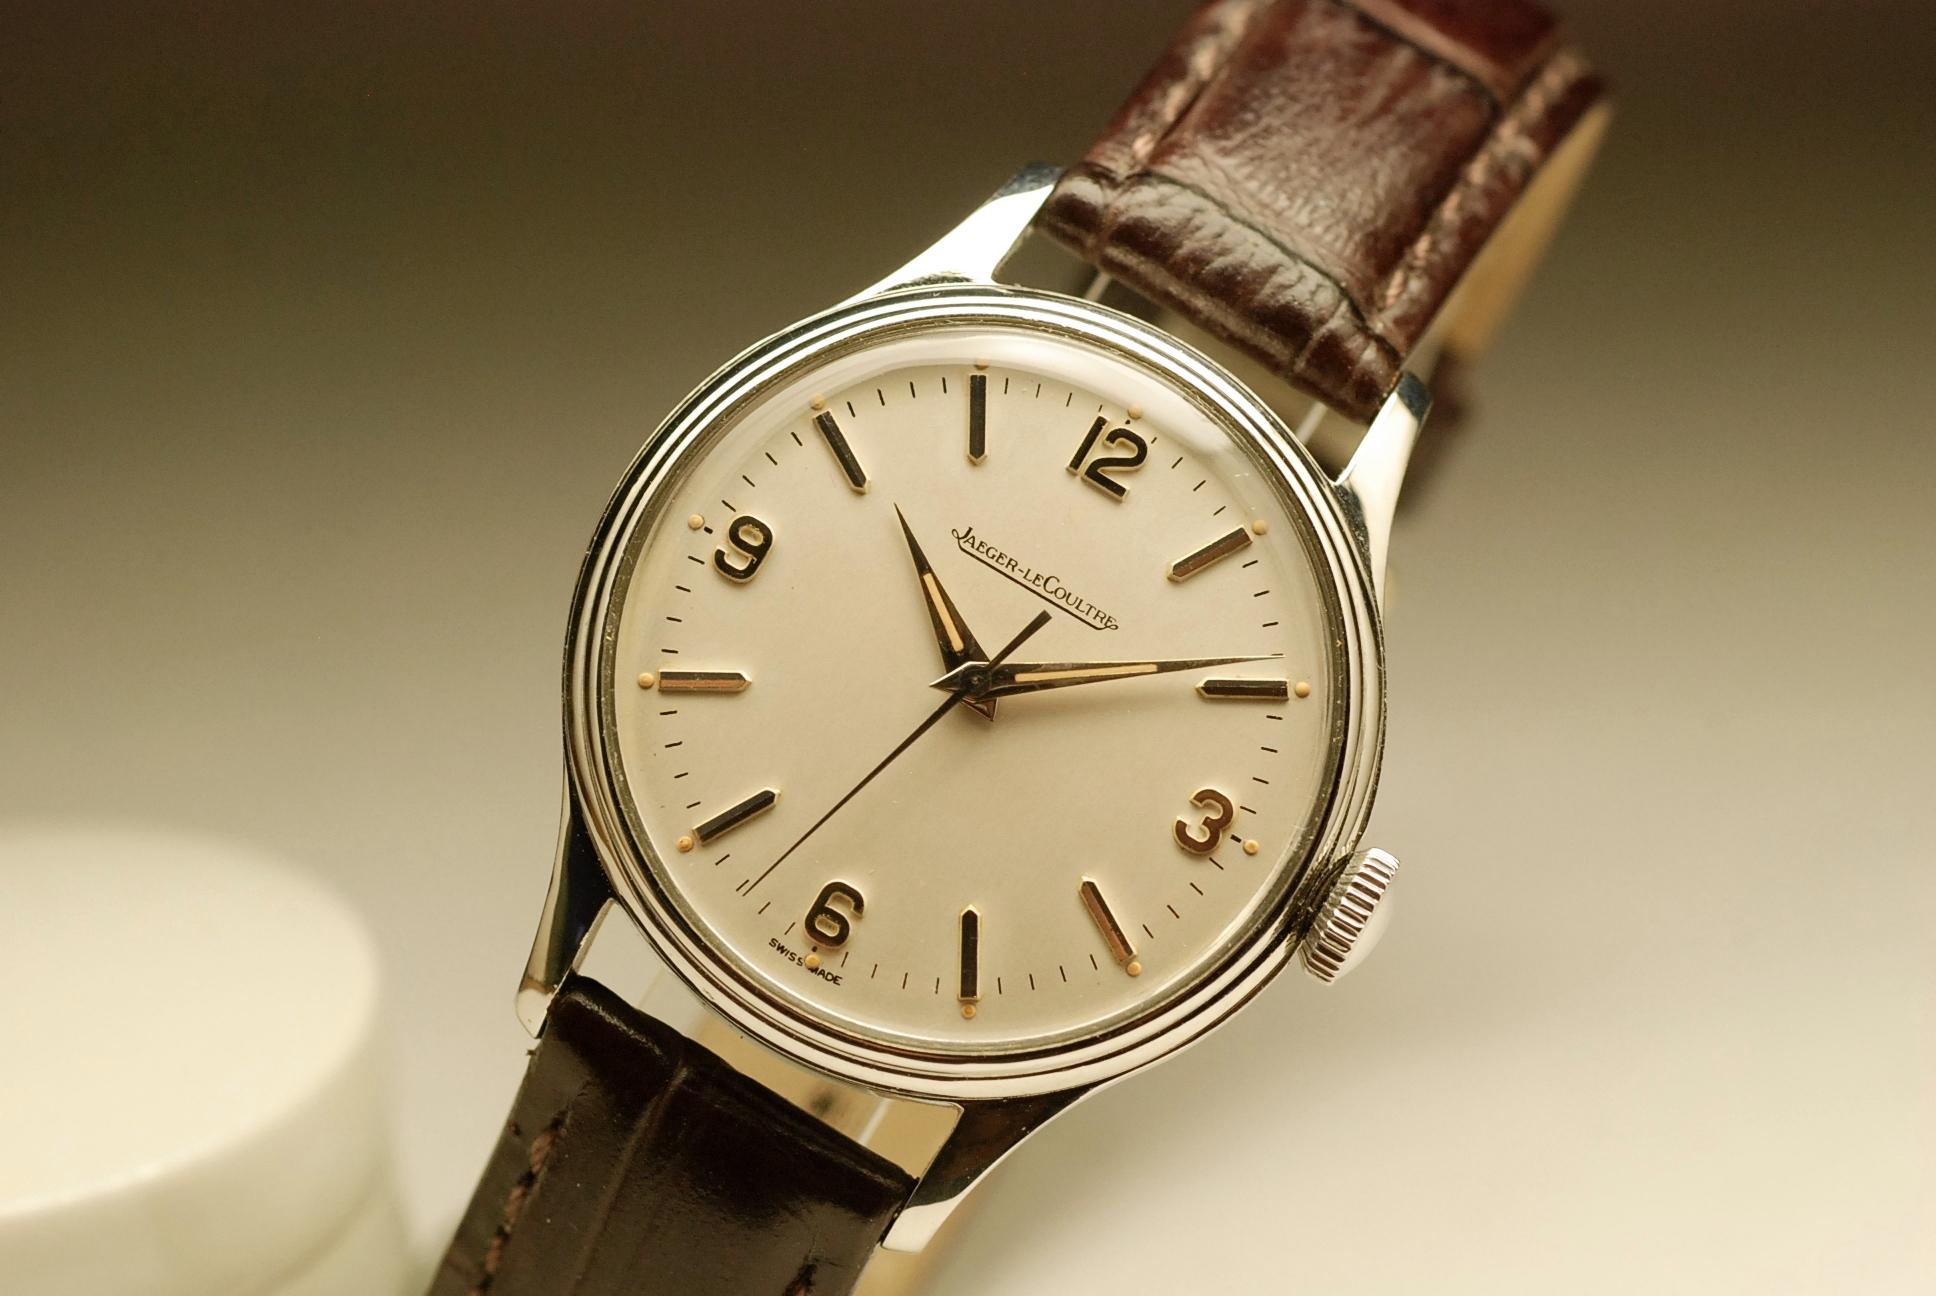 jaeger lecoultre vintage watch montre ancienne cal p478. Black Bedroom Furniture Sets. Home Design Ideas